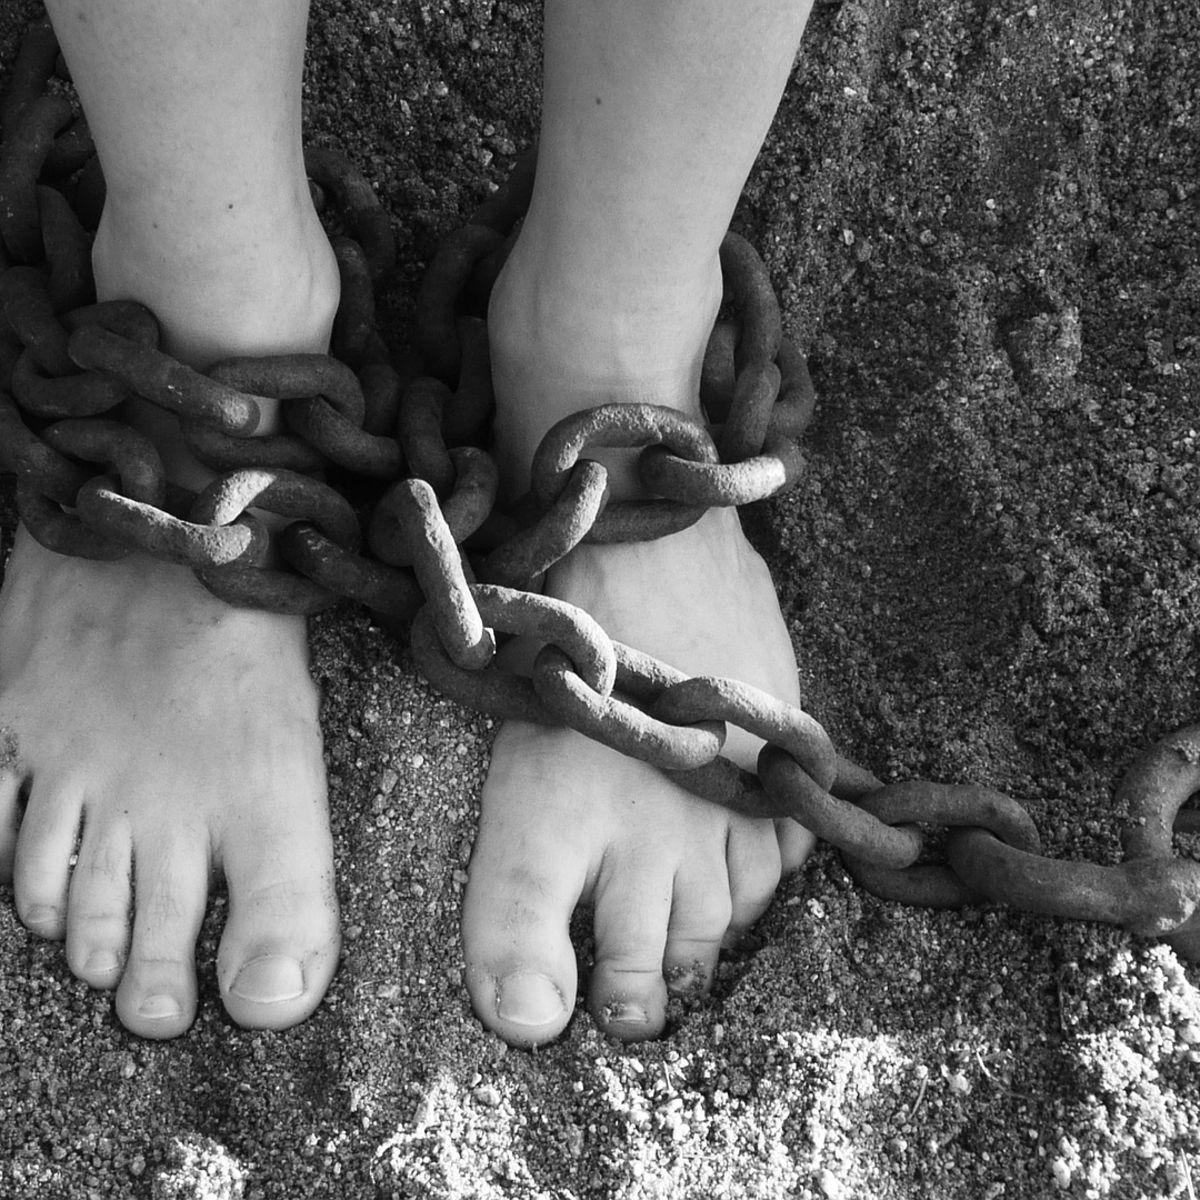 Slavery with chains around feet, bondage